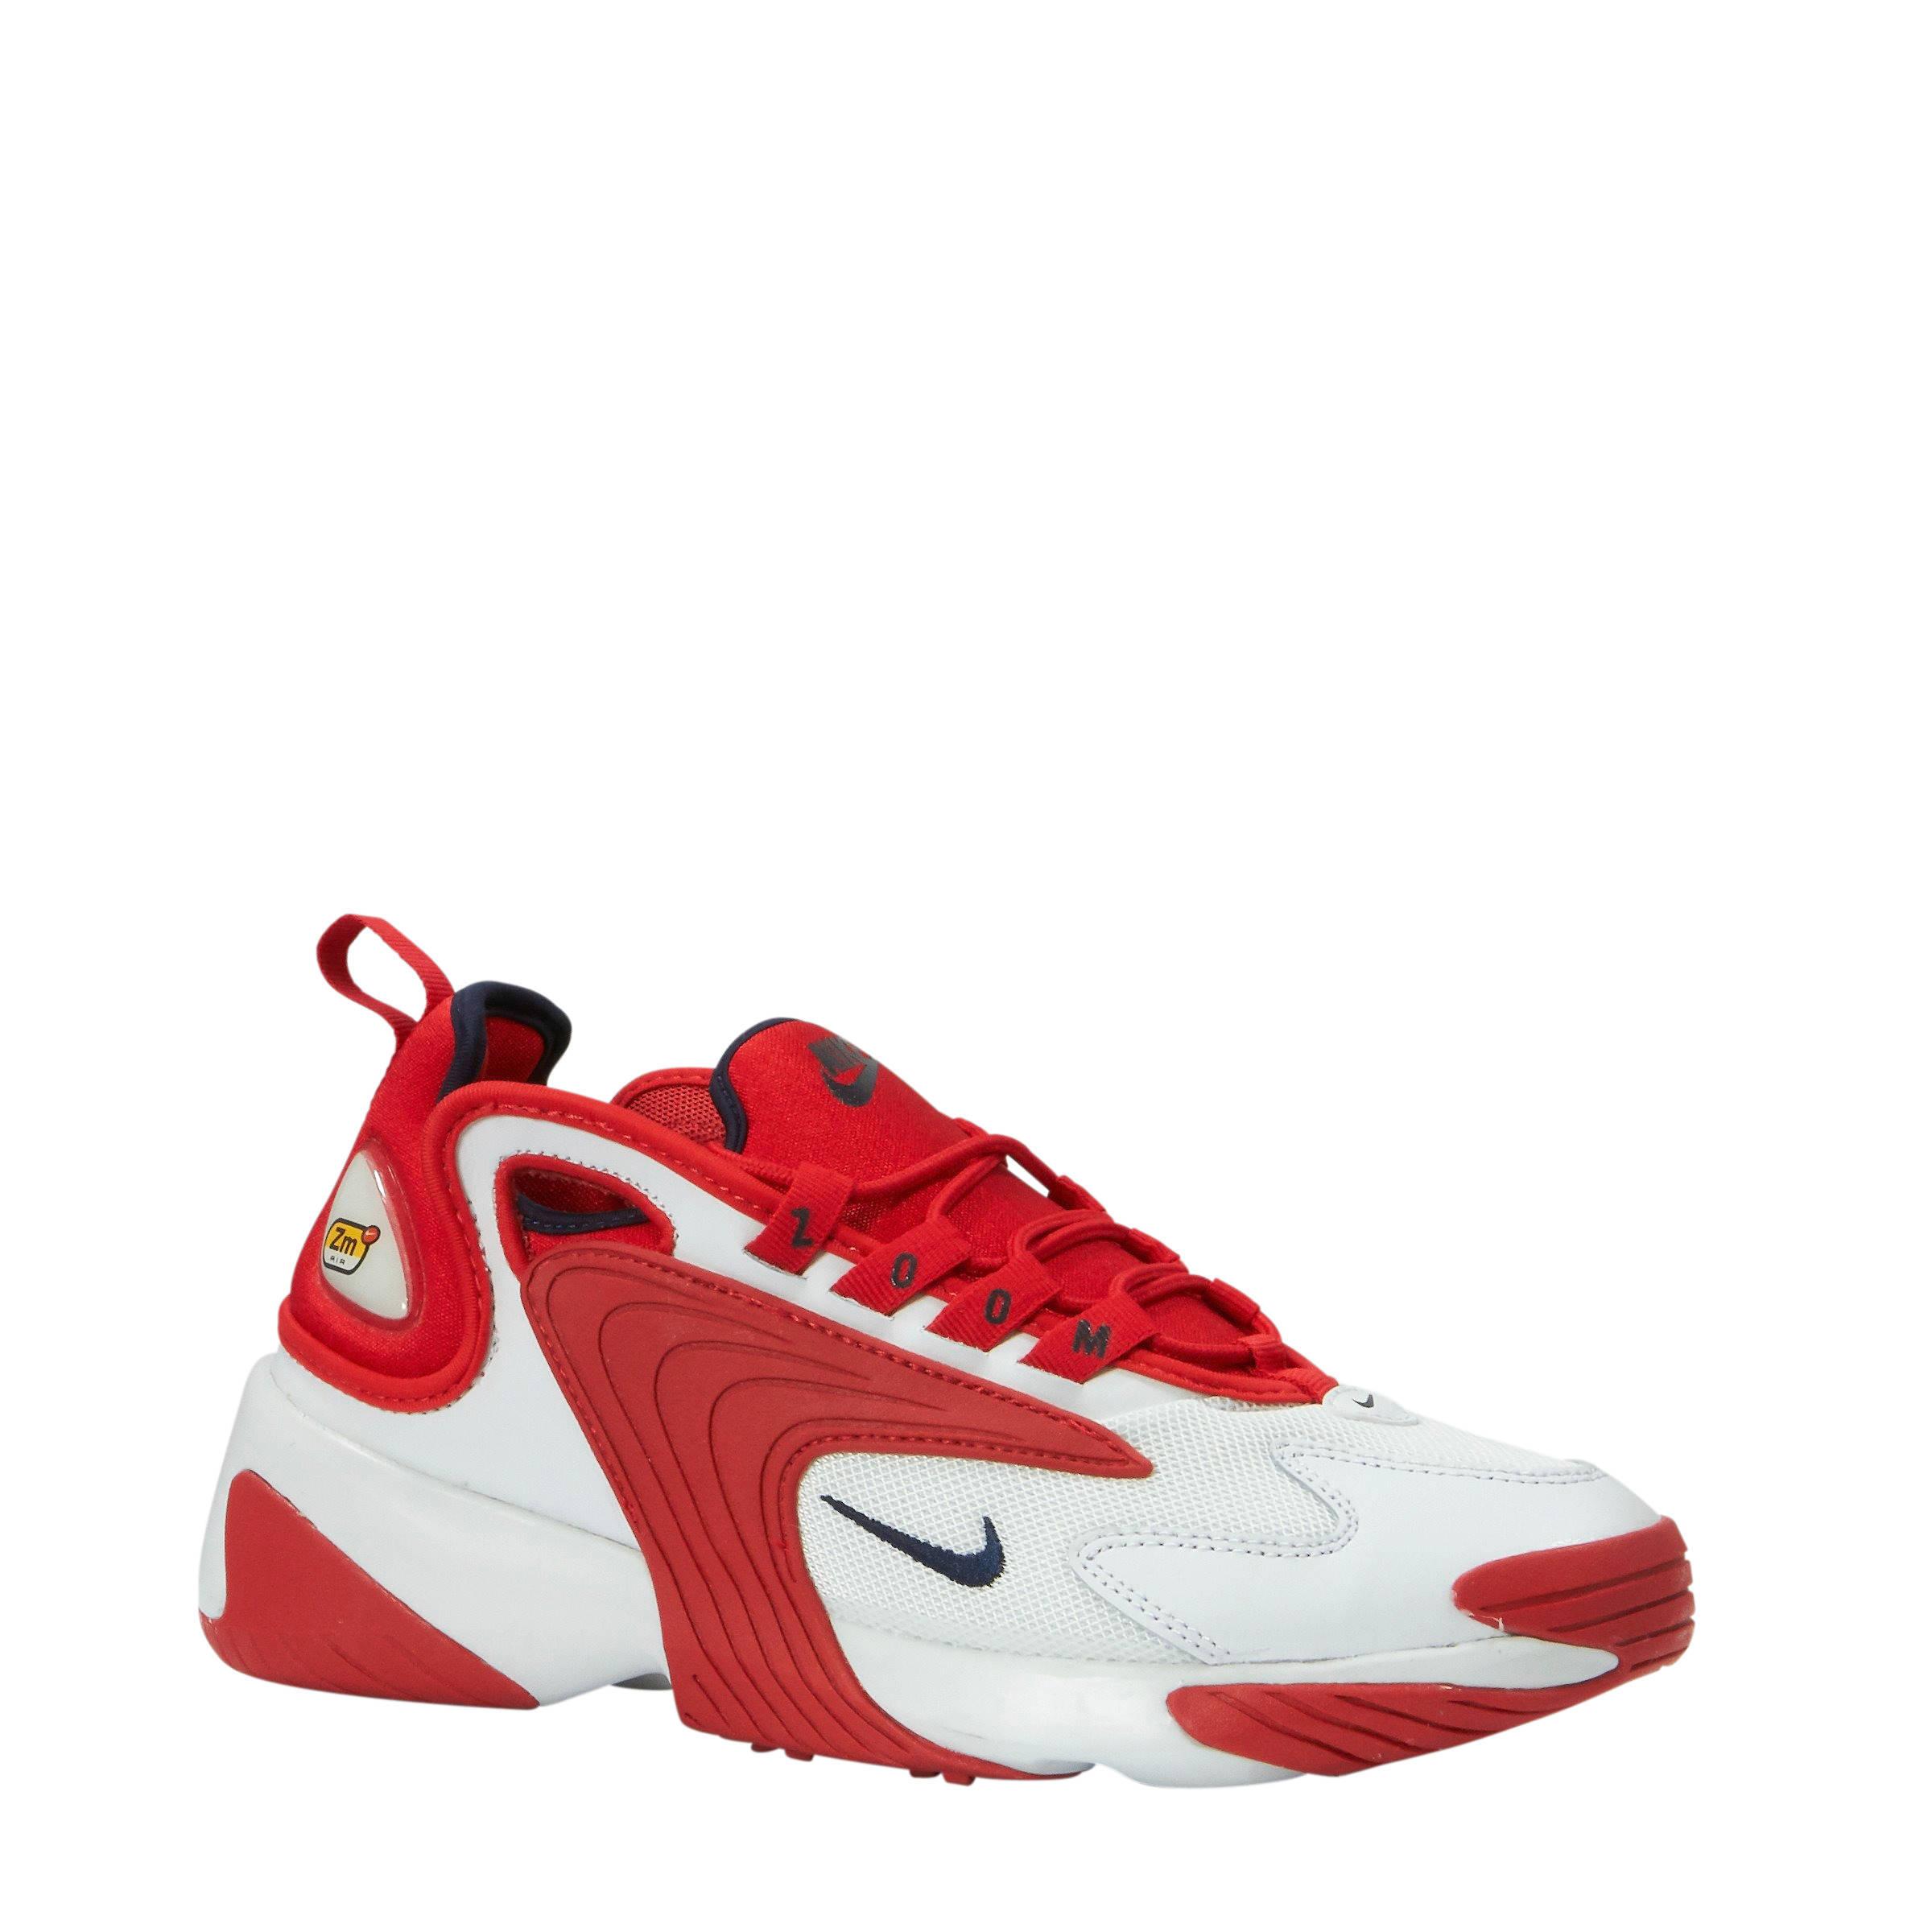 ZOOM 2K sneakers wit/rood